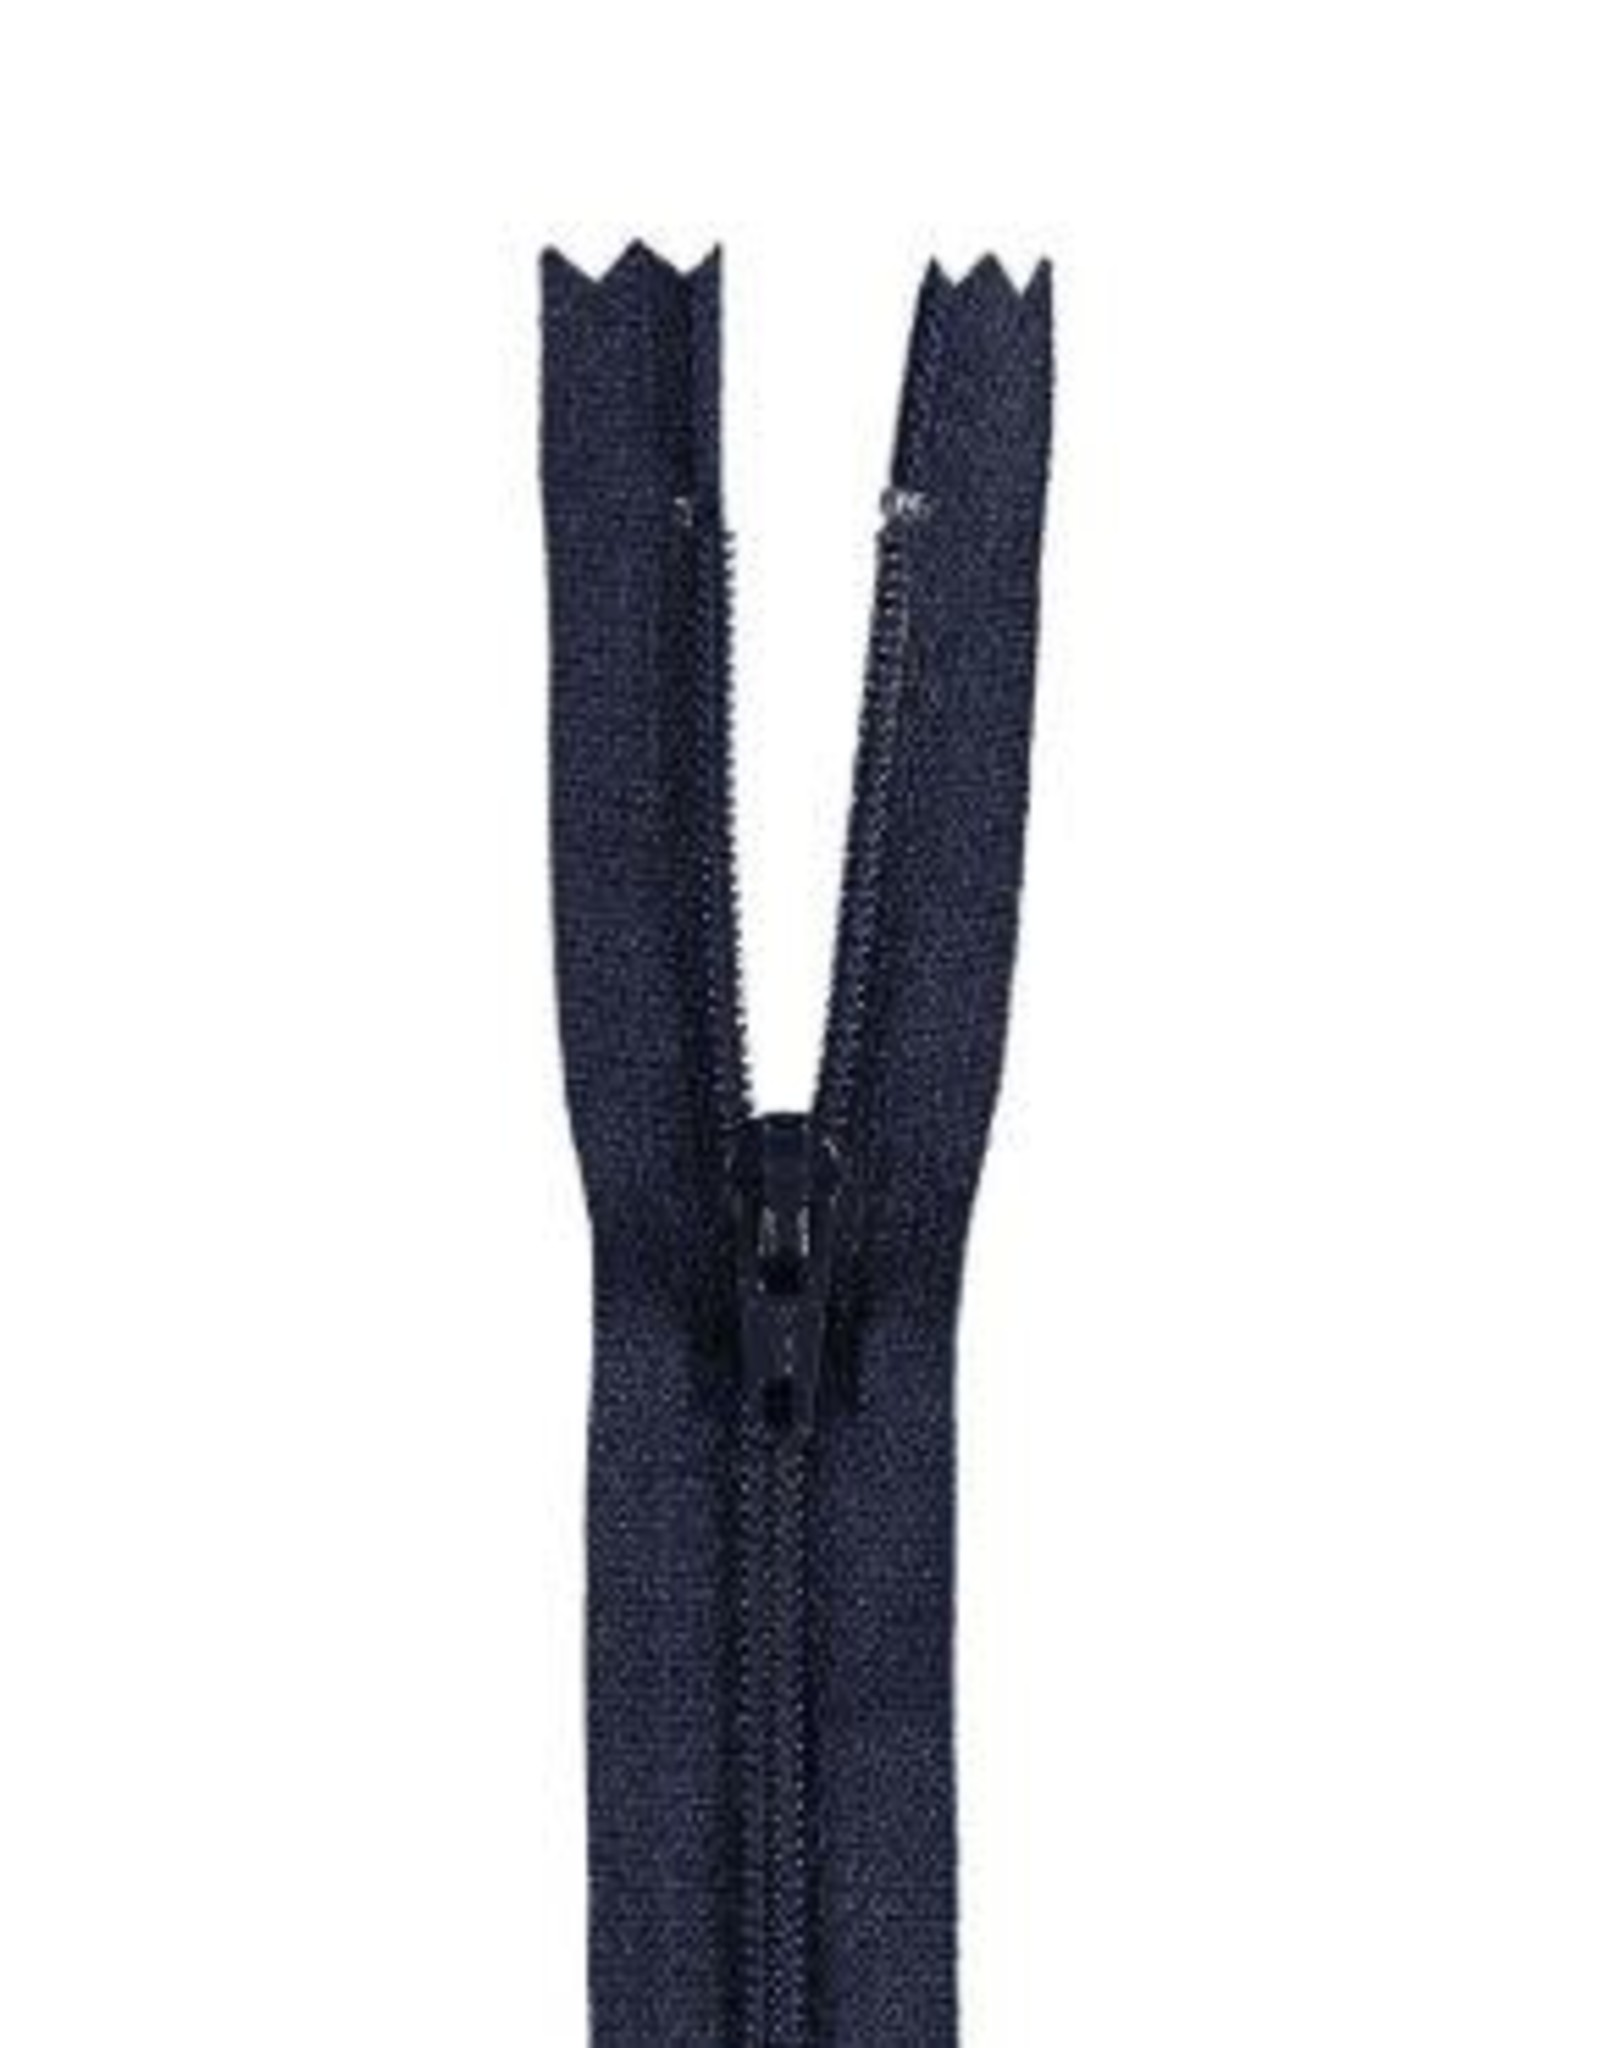 YKK Spiraalrits niet-DB 3mm d. blauw gr 168-50cm